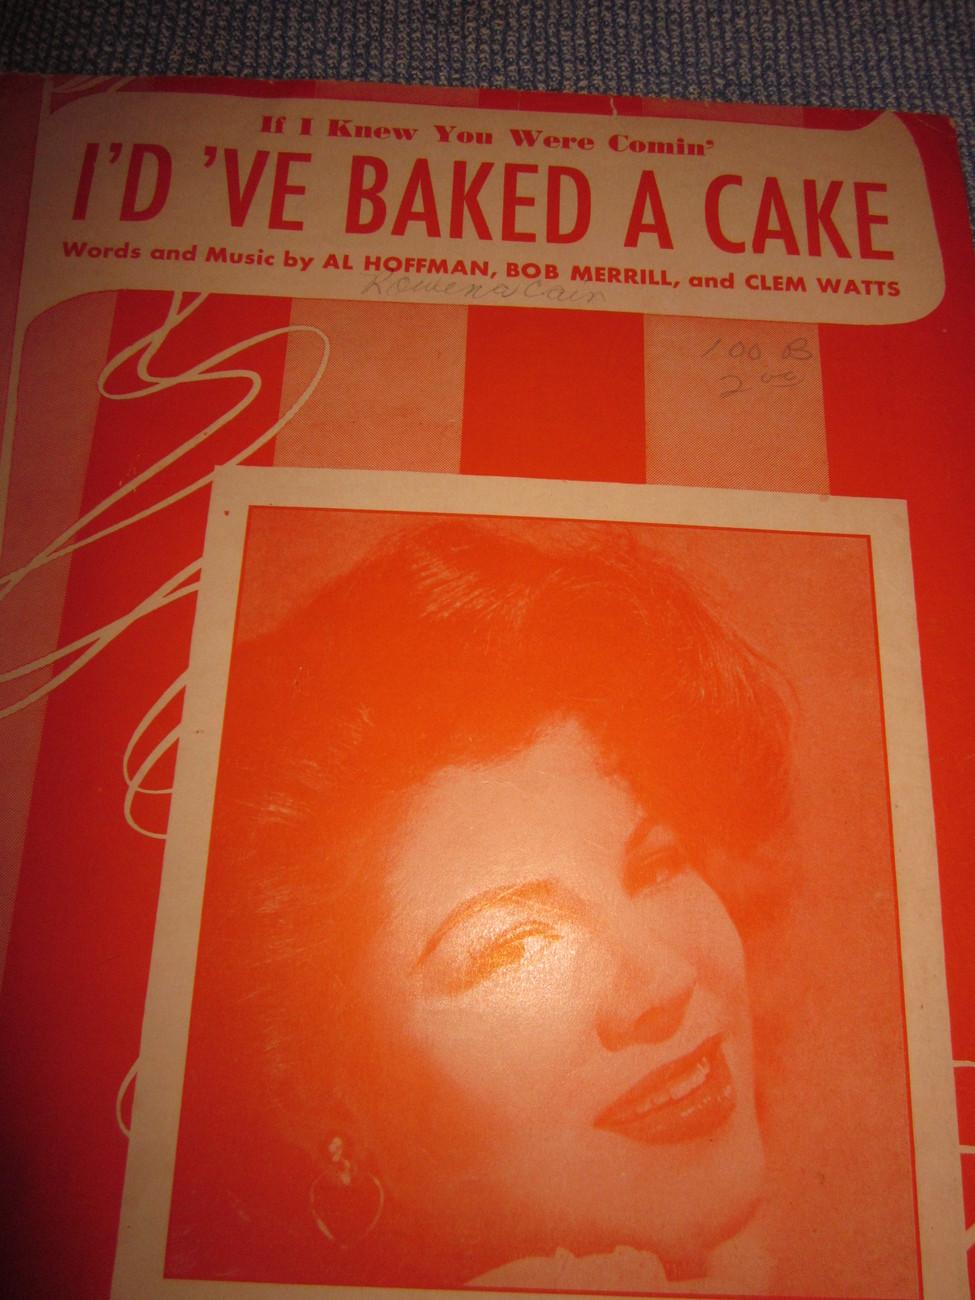 Vintage Sheet Music Id've Baked A Cake - Eileen Barton 1950